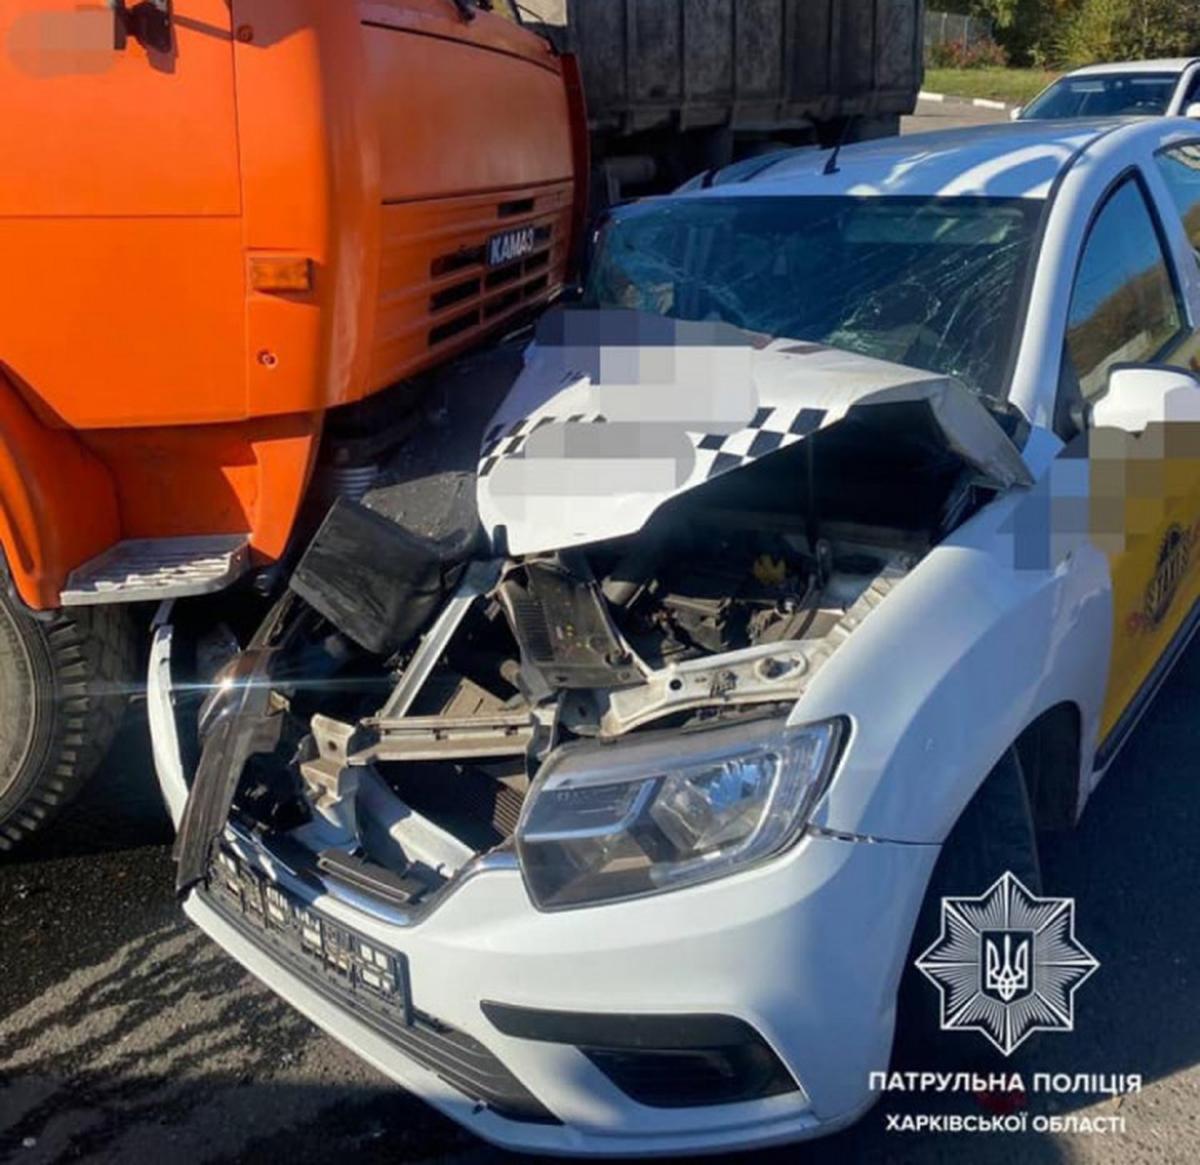 ДТП Харькове: На улице Веснина КАМАЗ столкнулся с Renault Logan службы такси